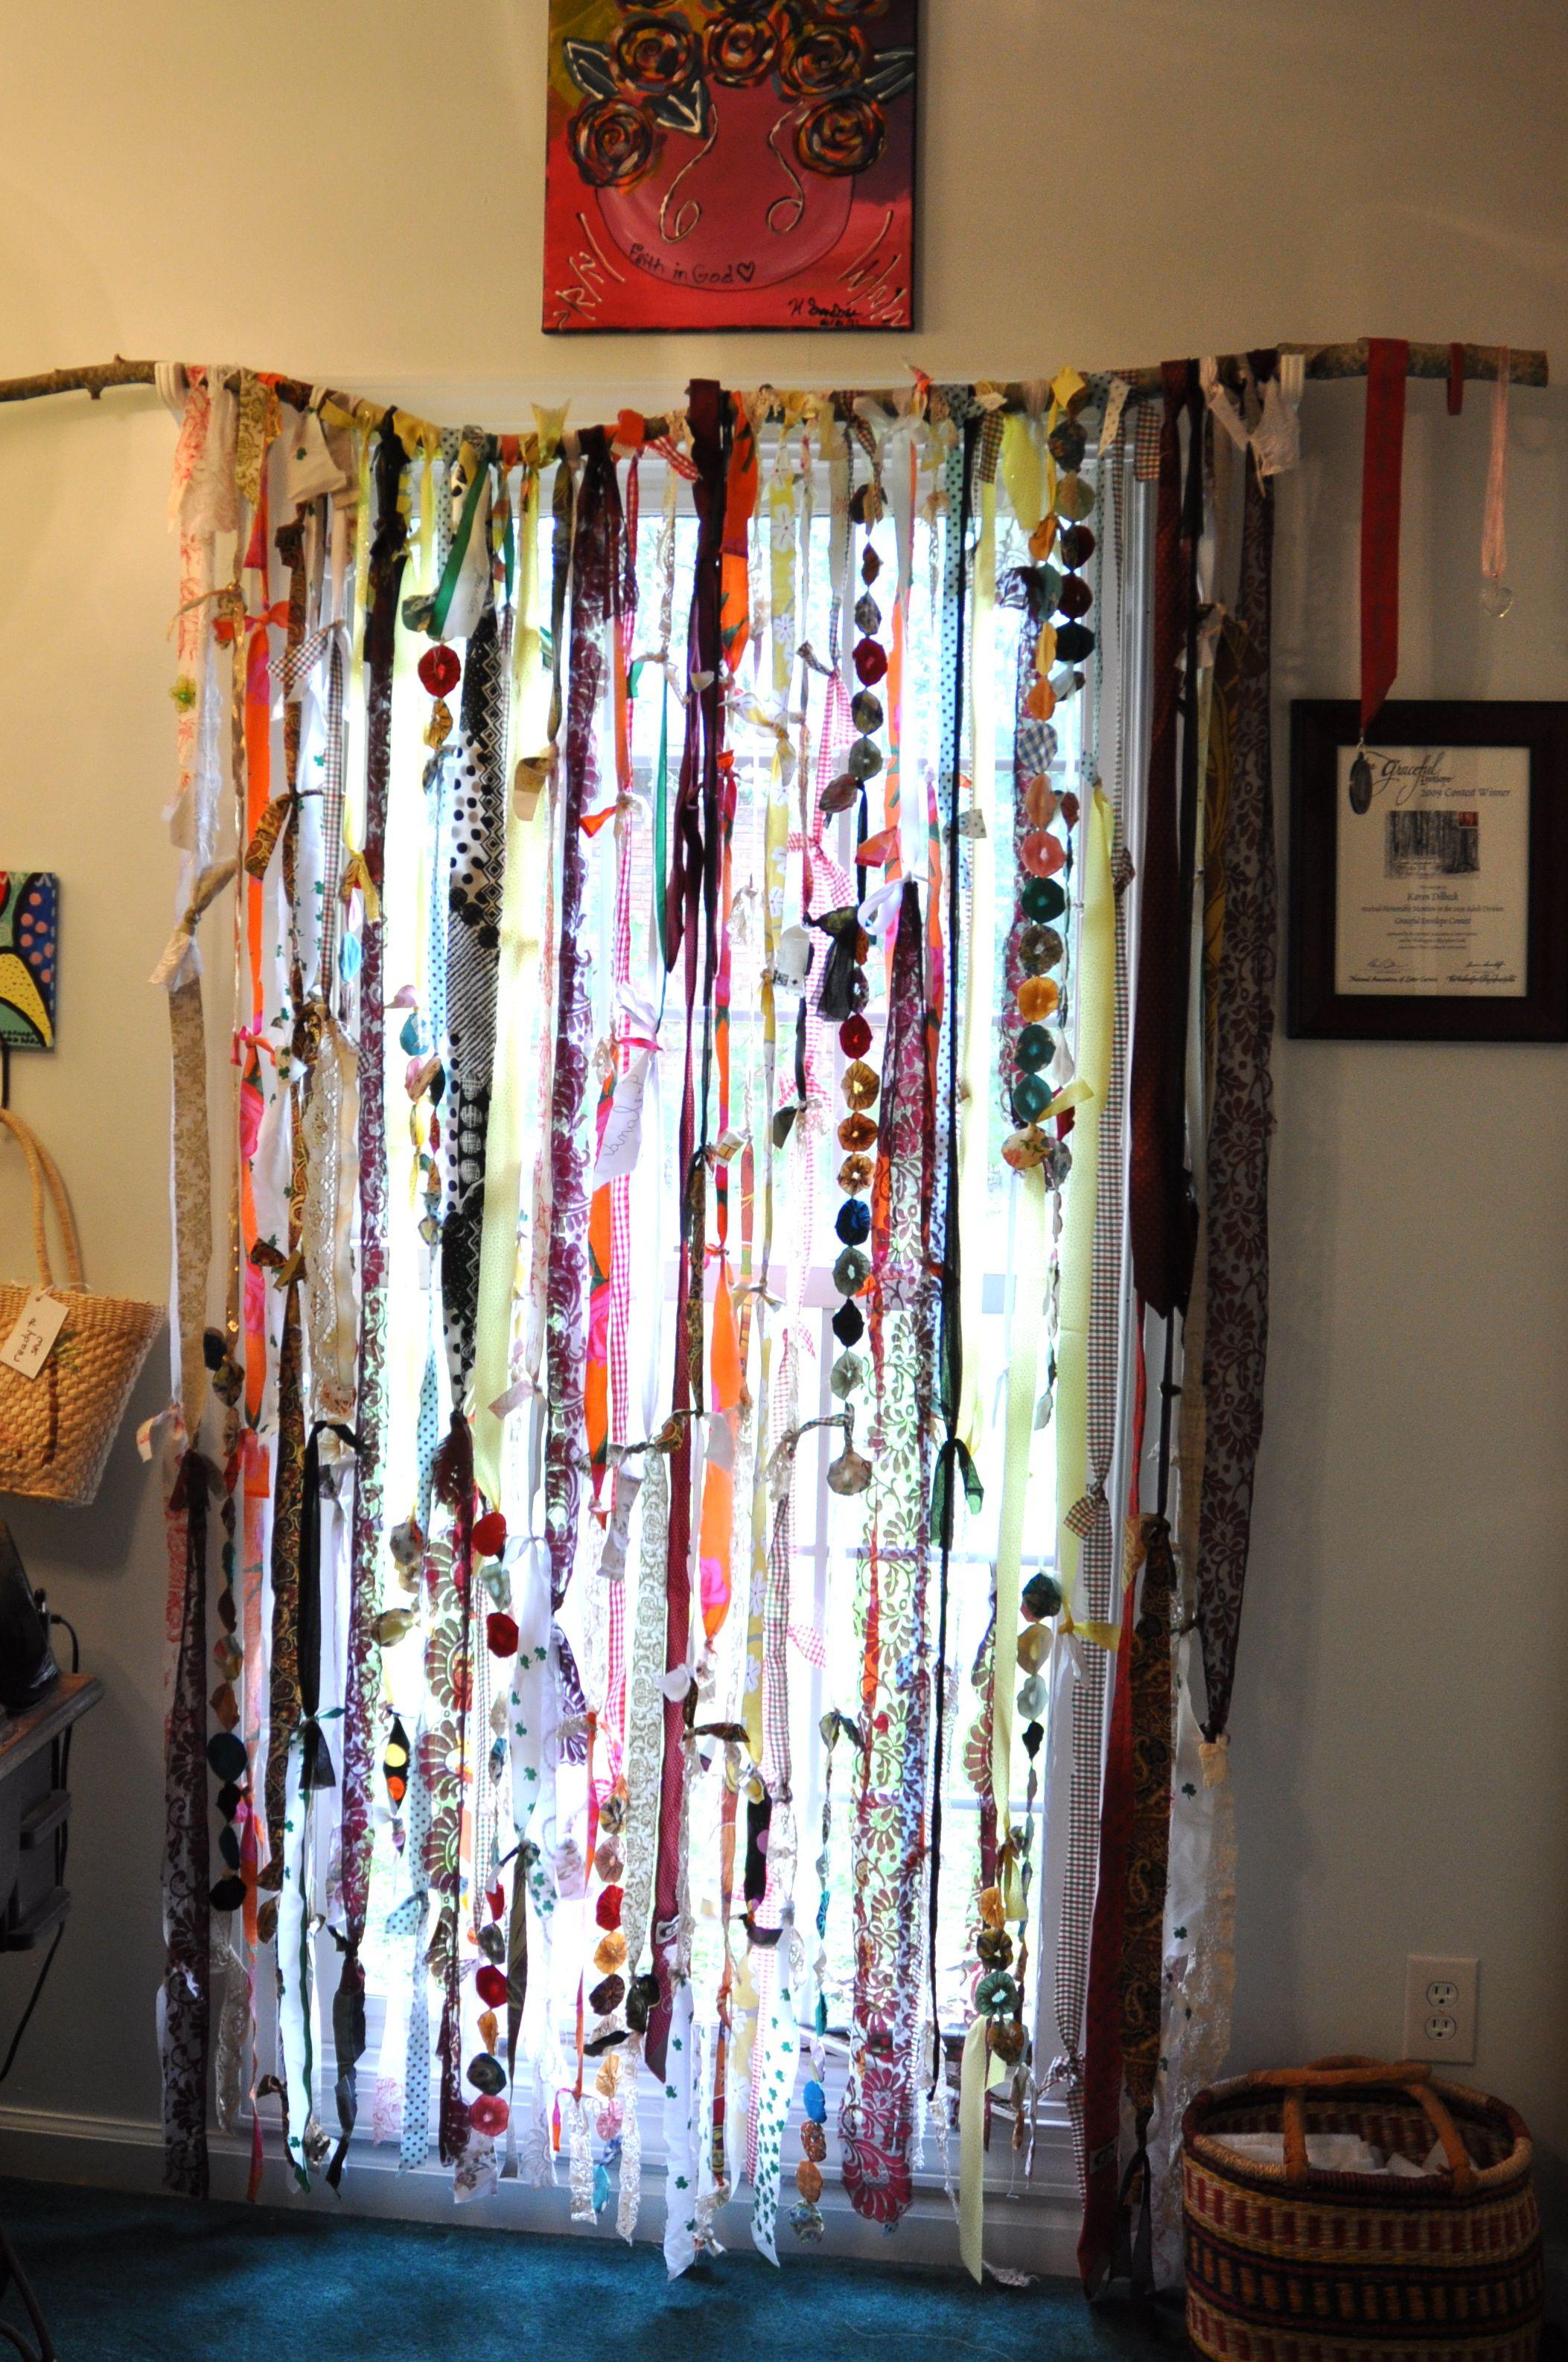 Boho window curtains - Bohemian Room Bohemian Gypsy Bohemian Style Hippy Bedroom Boho Curtains Beaded Curtains Bedroom Window Treatments Curtain Door Bedroom Windows